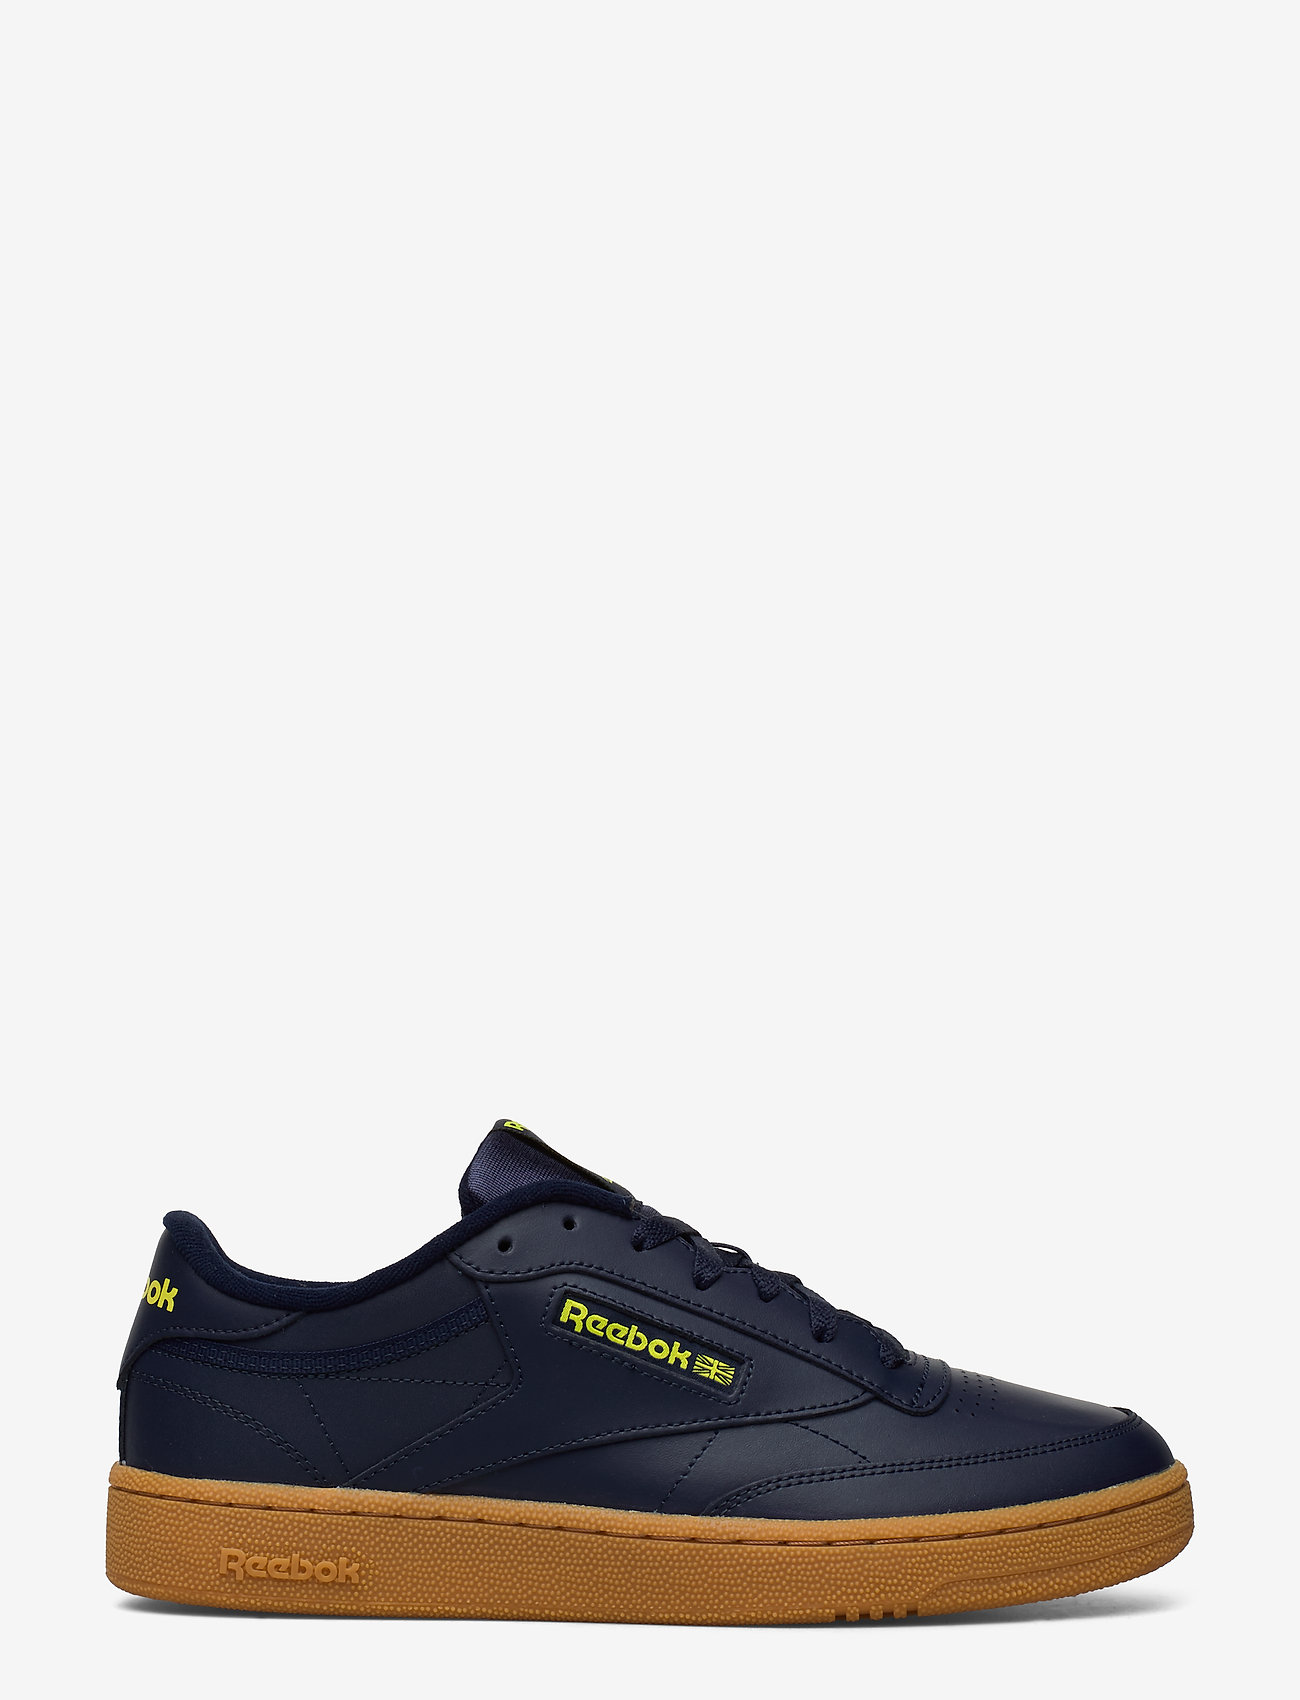 Reebok Classics Club C 85 Mu - Sneakers